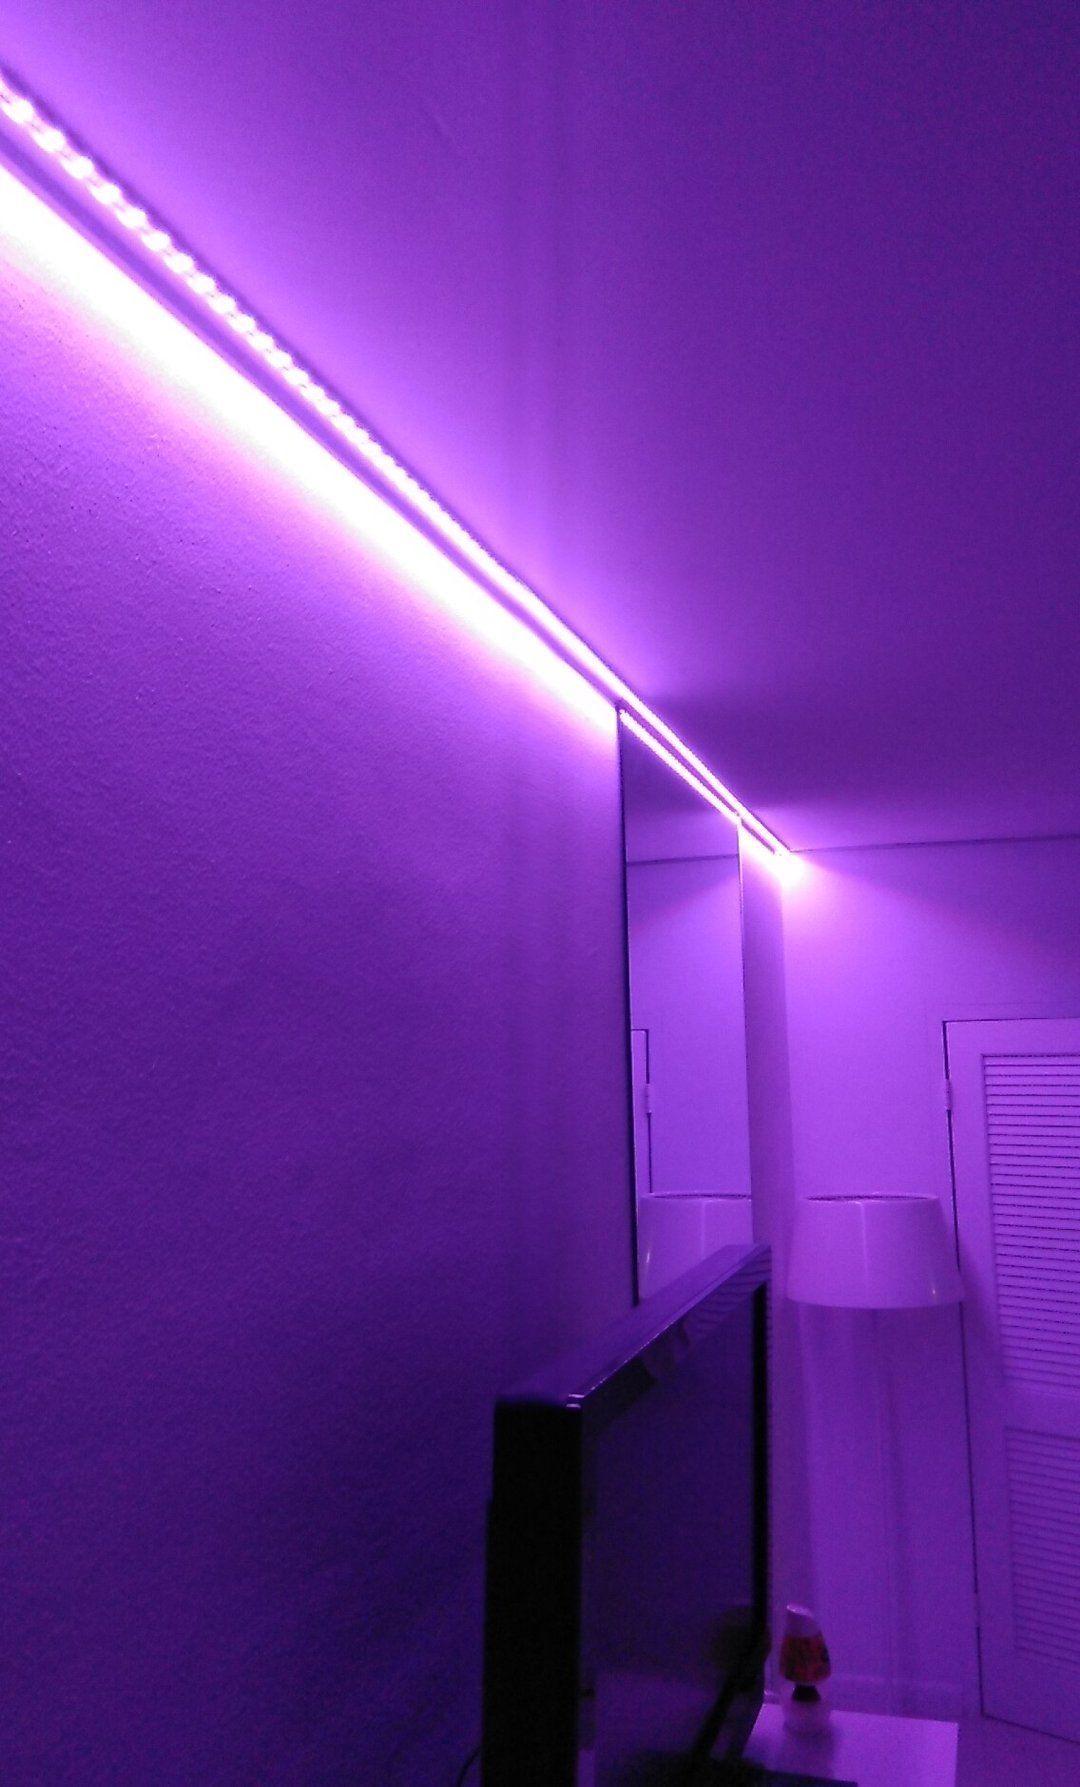 Led Wall Lights 8w Colorful Sconce Indoor Wall Lamp Modern Throughout Led Lights For Room Decoration In 2020 Led Strip Lights Bedroom Led Lighting Bedroom Room Lights